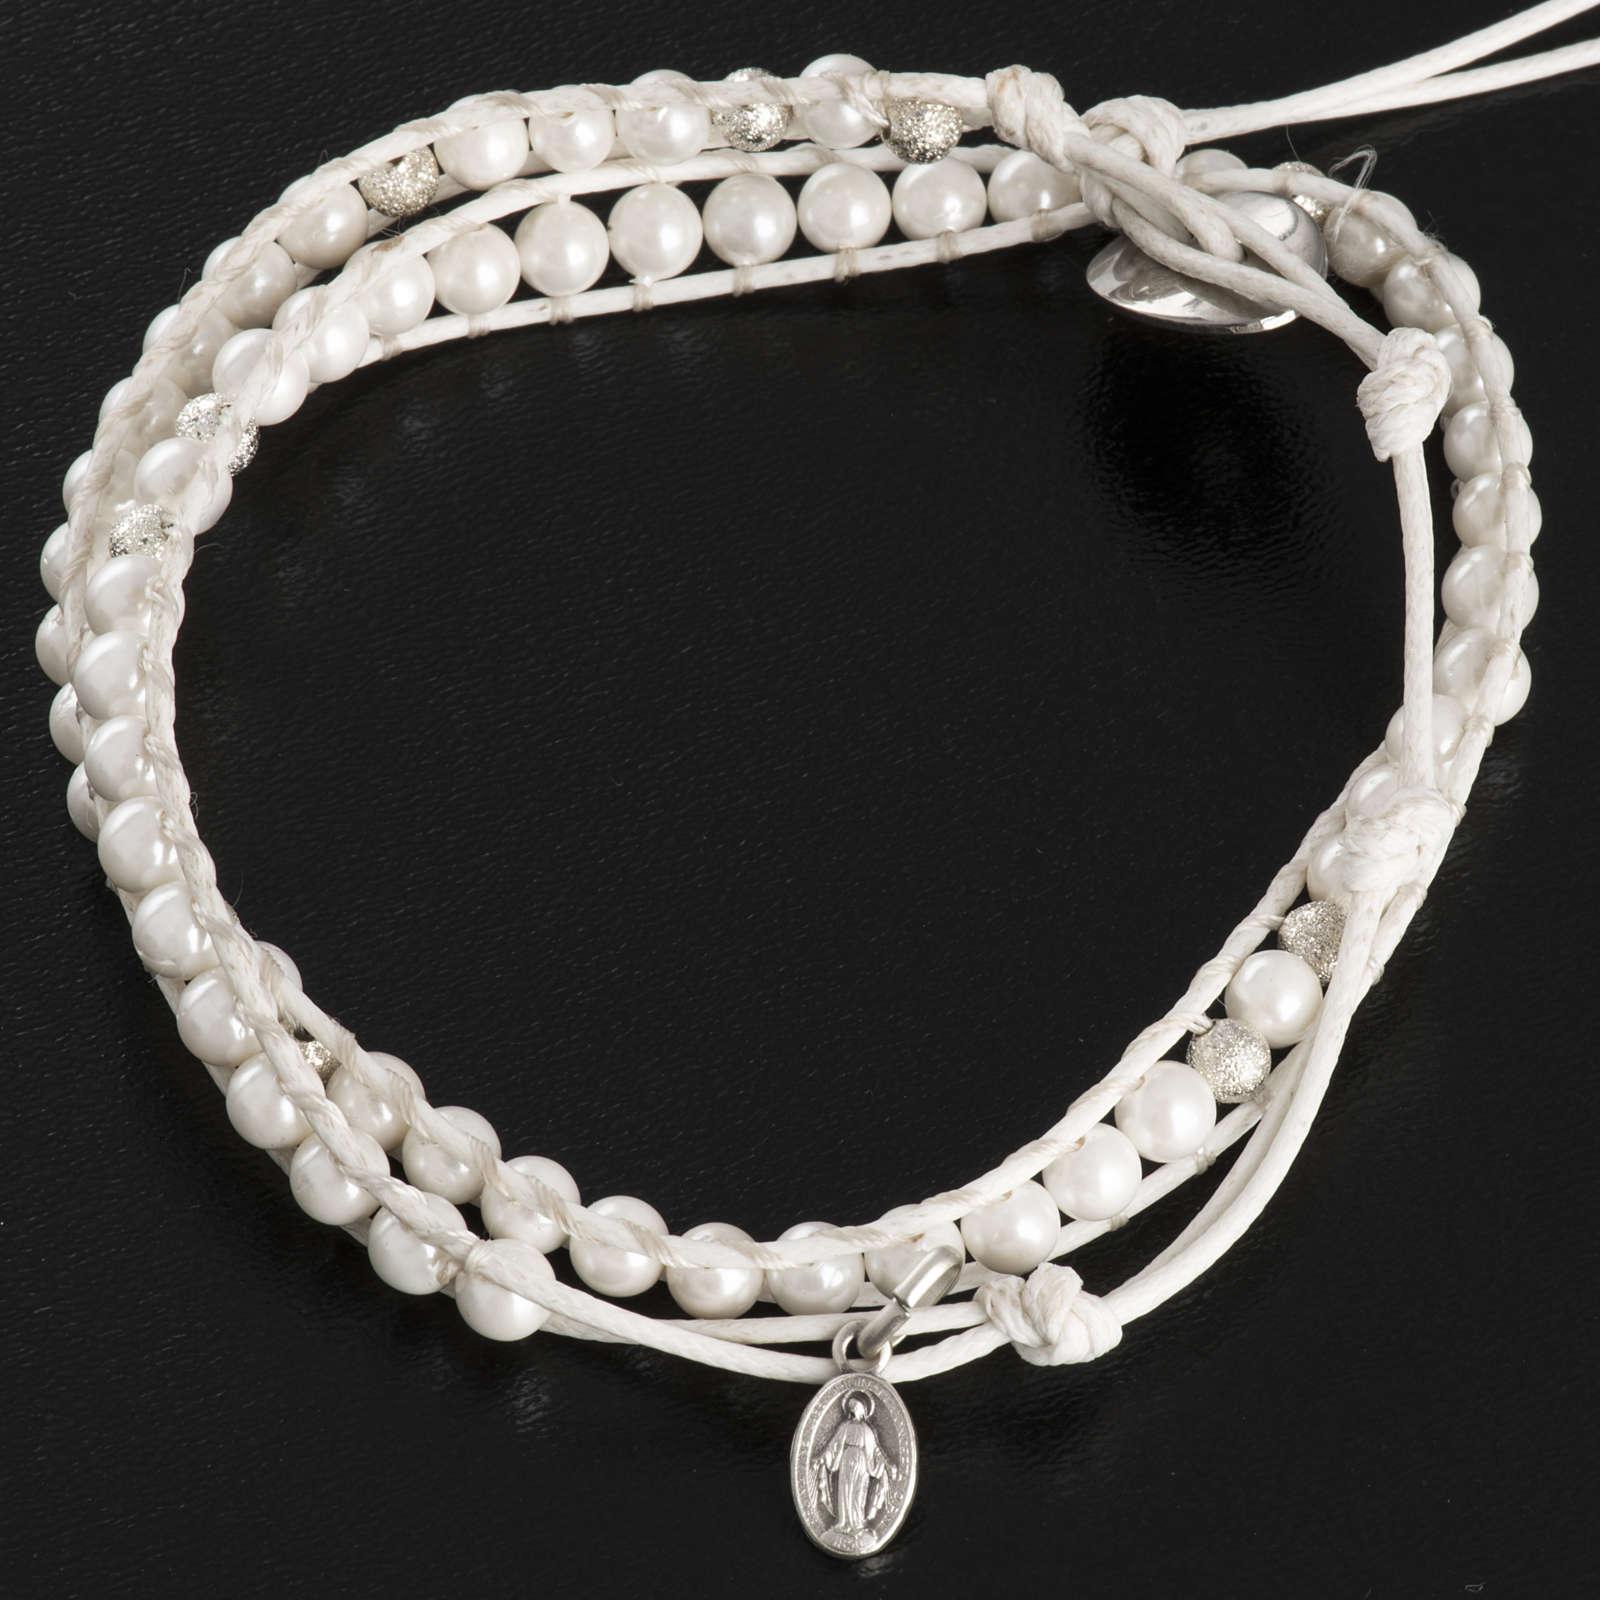 Mother of pearl bracelet 4mm 4